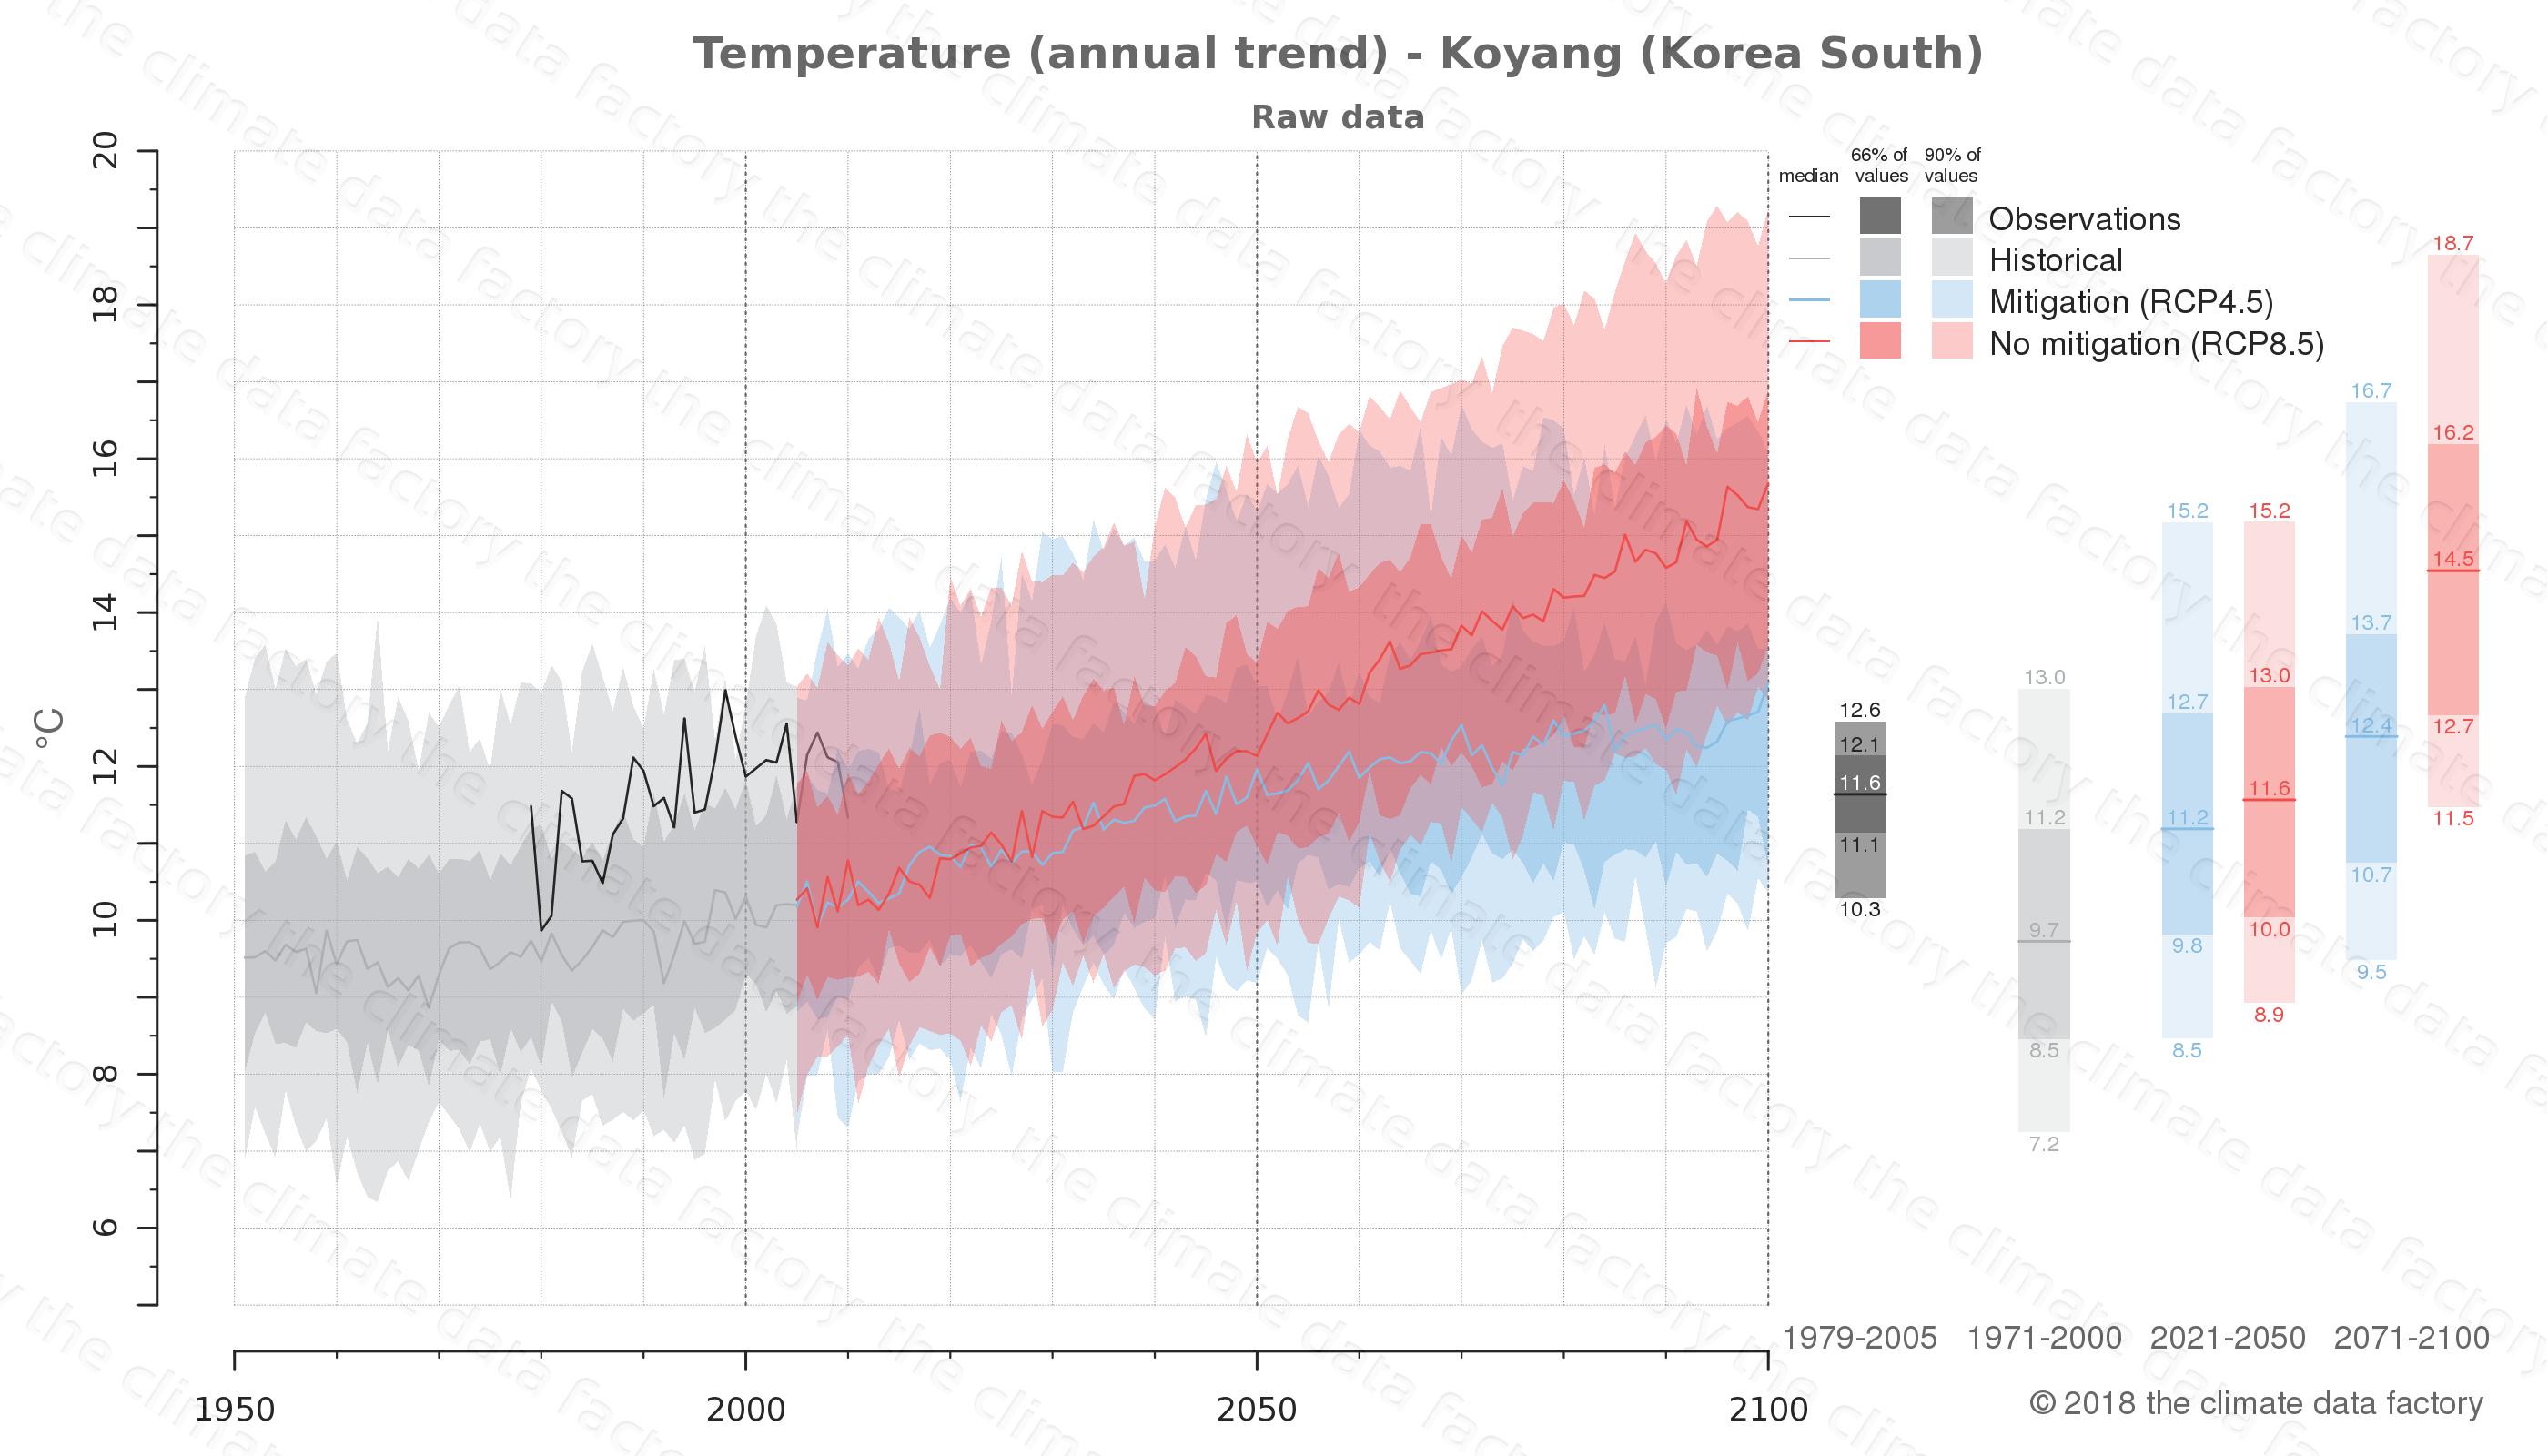 climate change data policy adaptation climate graph city data temperature koyang south korea